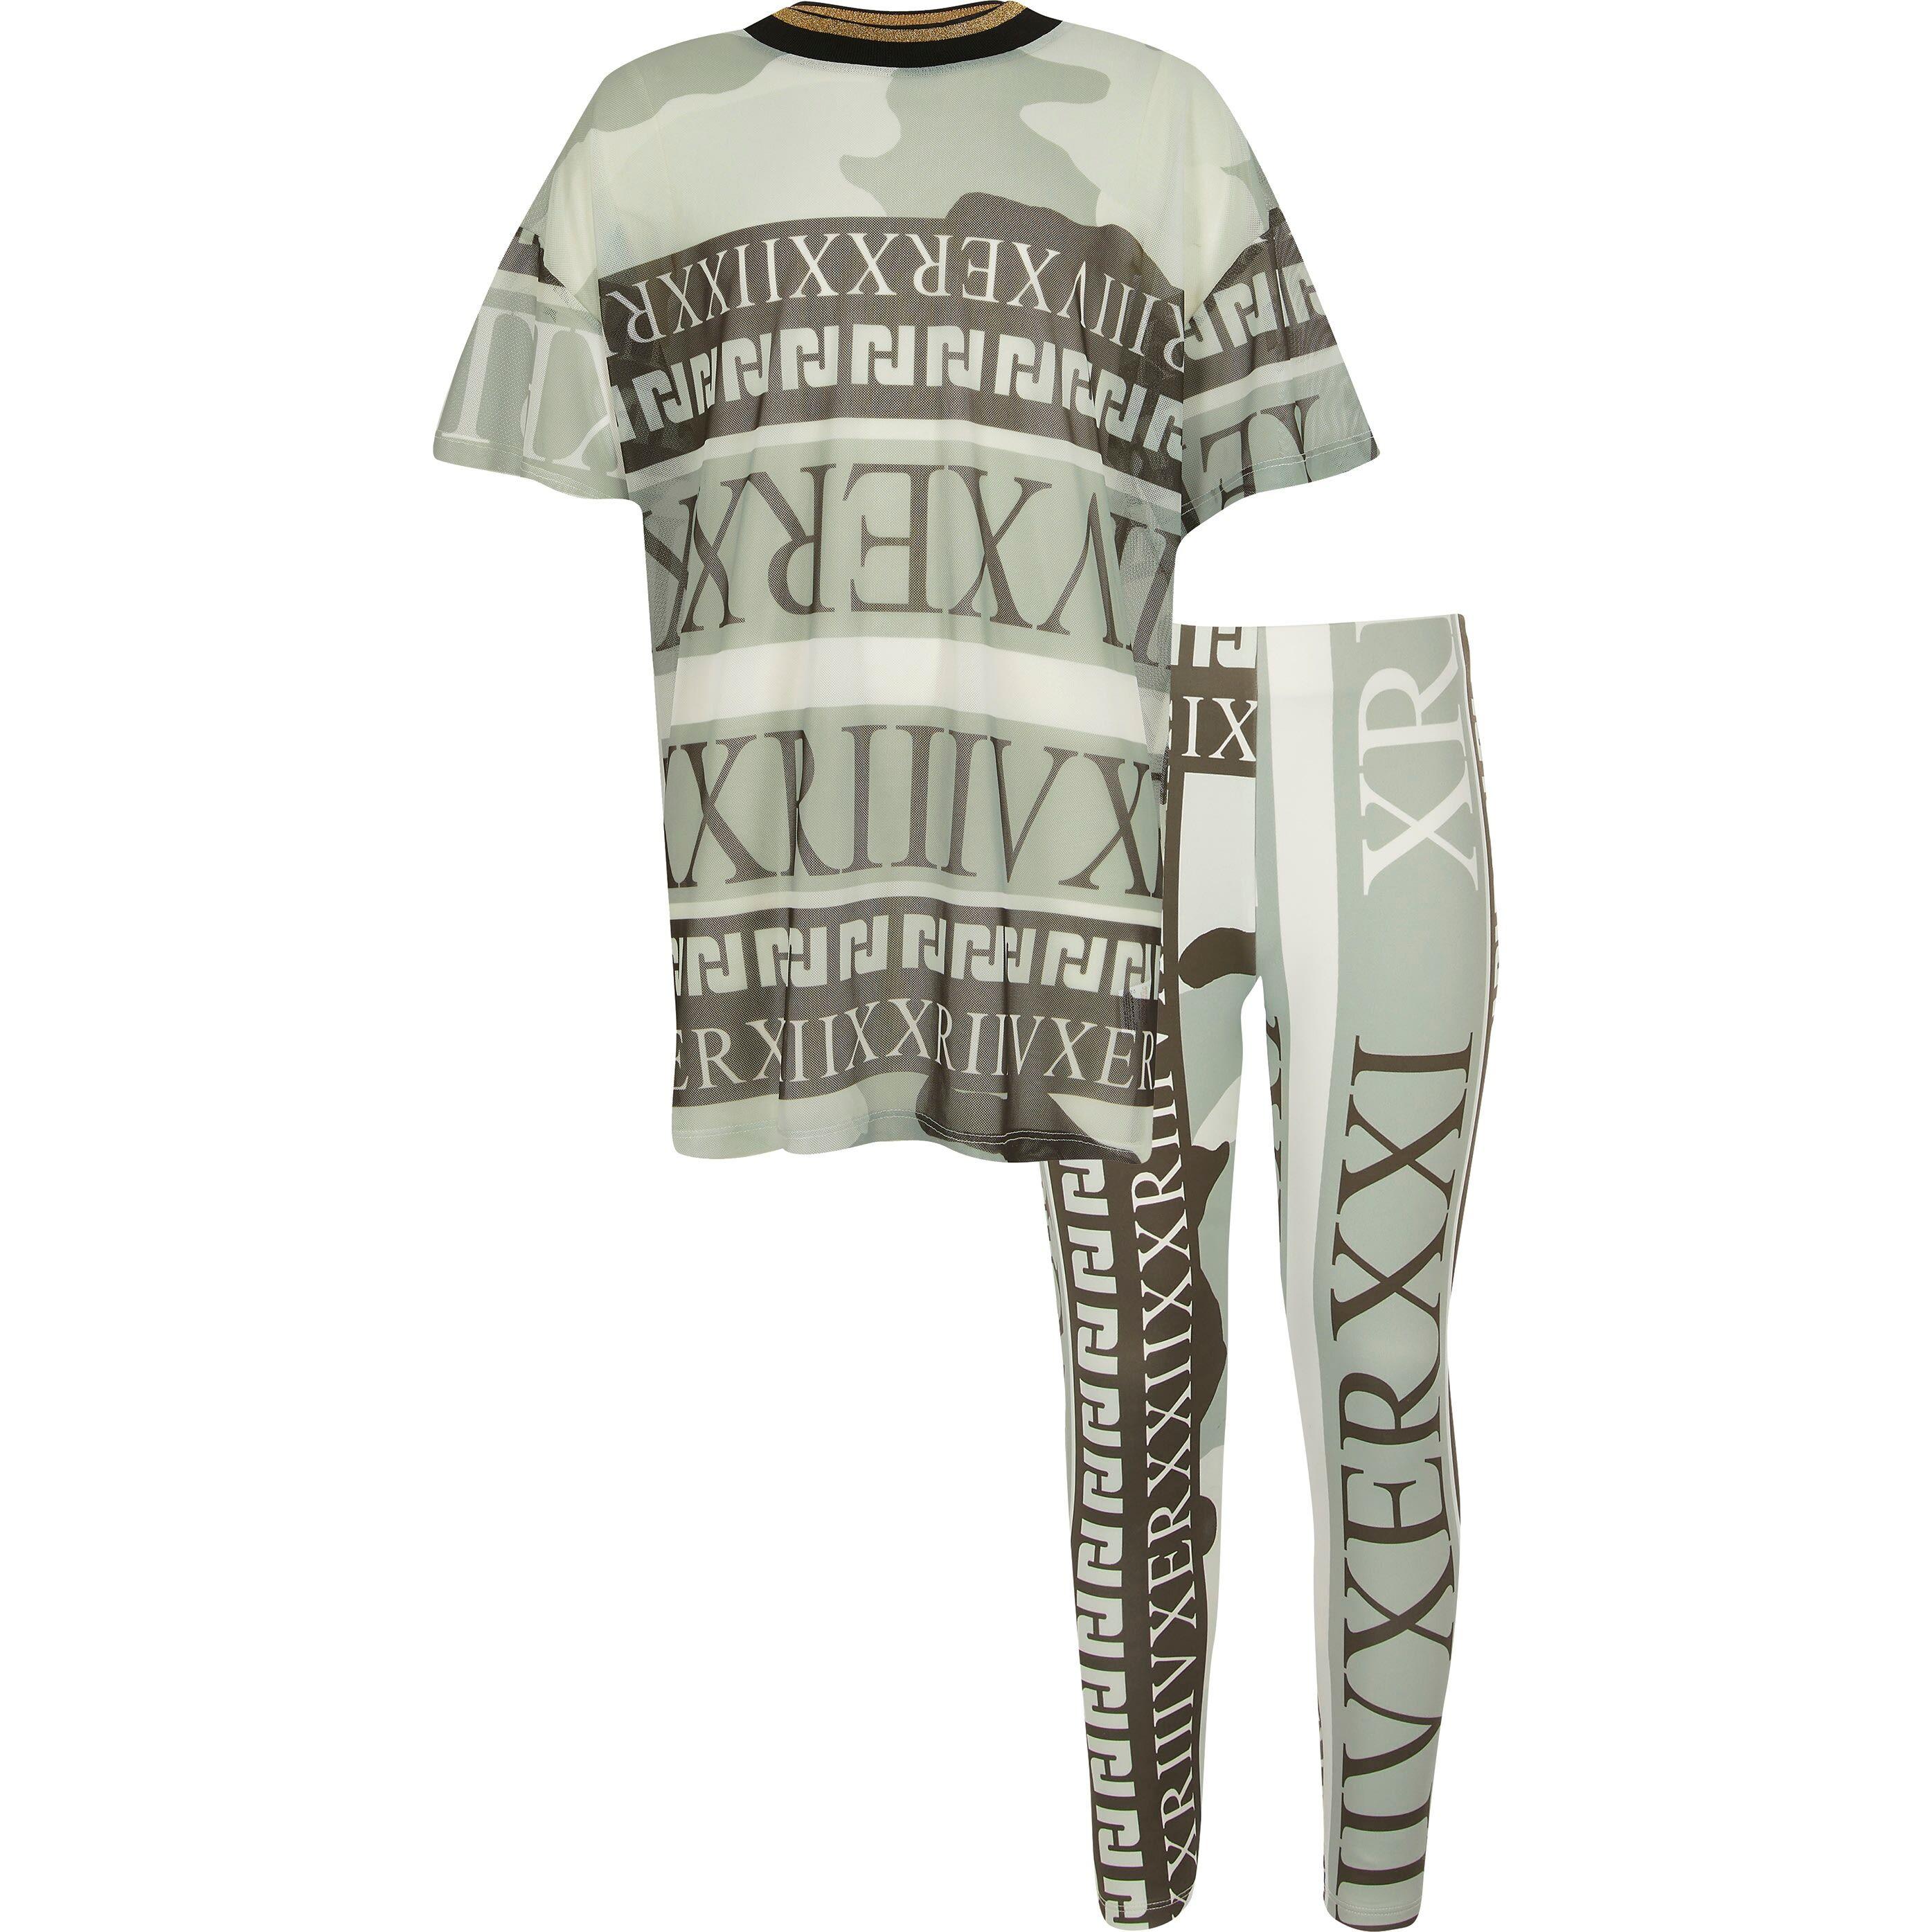 River Island Girls Green camo mesh T-shirt outfit (7-8 Yrs)